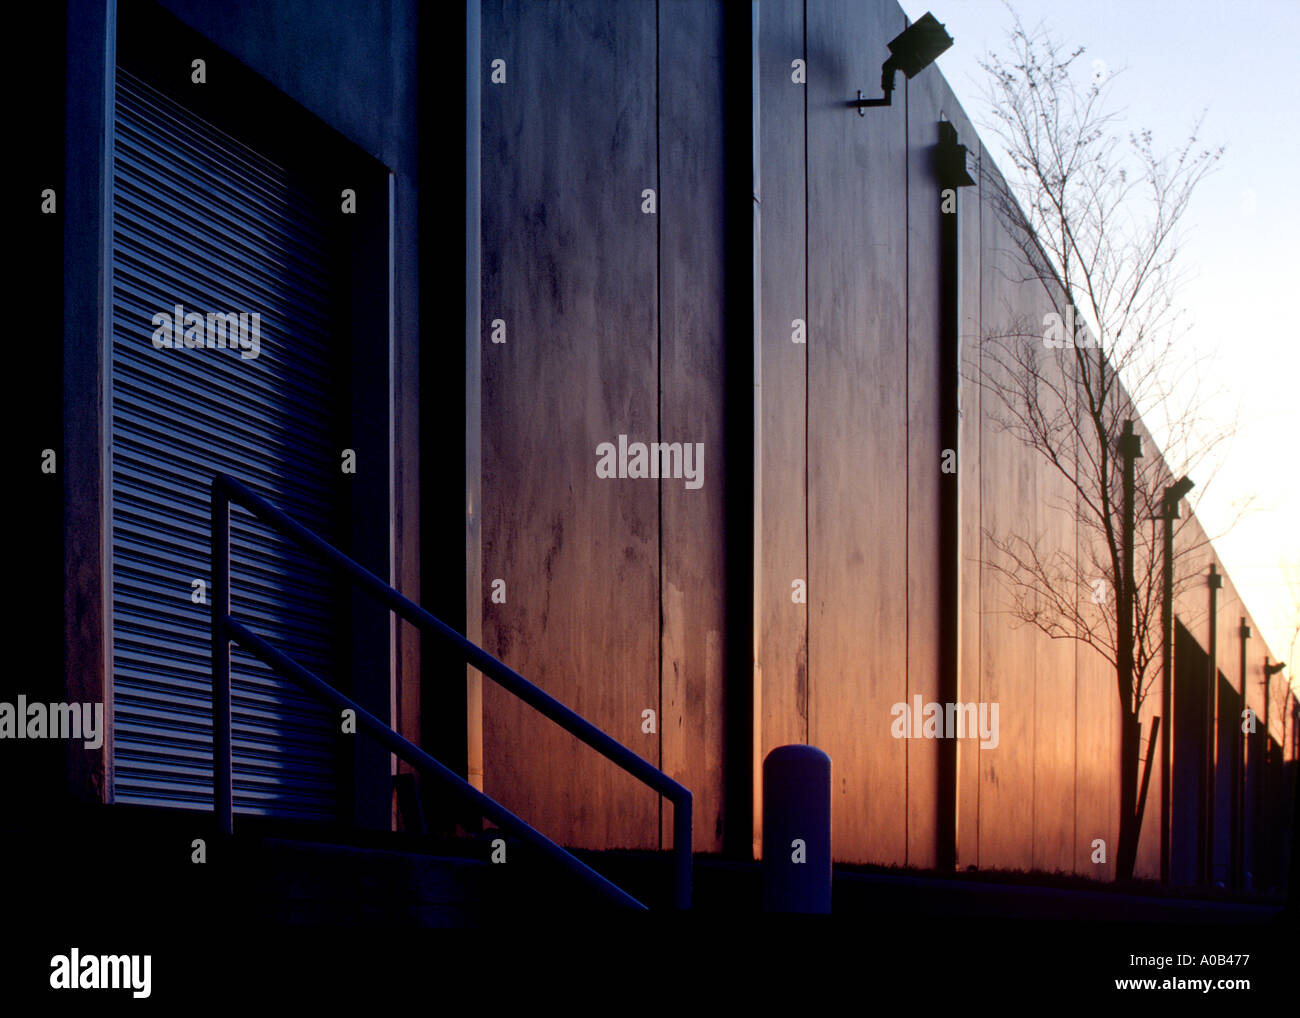 warehouse - Stock Image